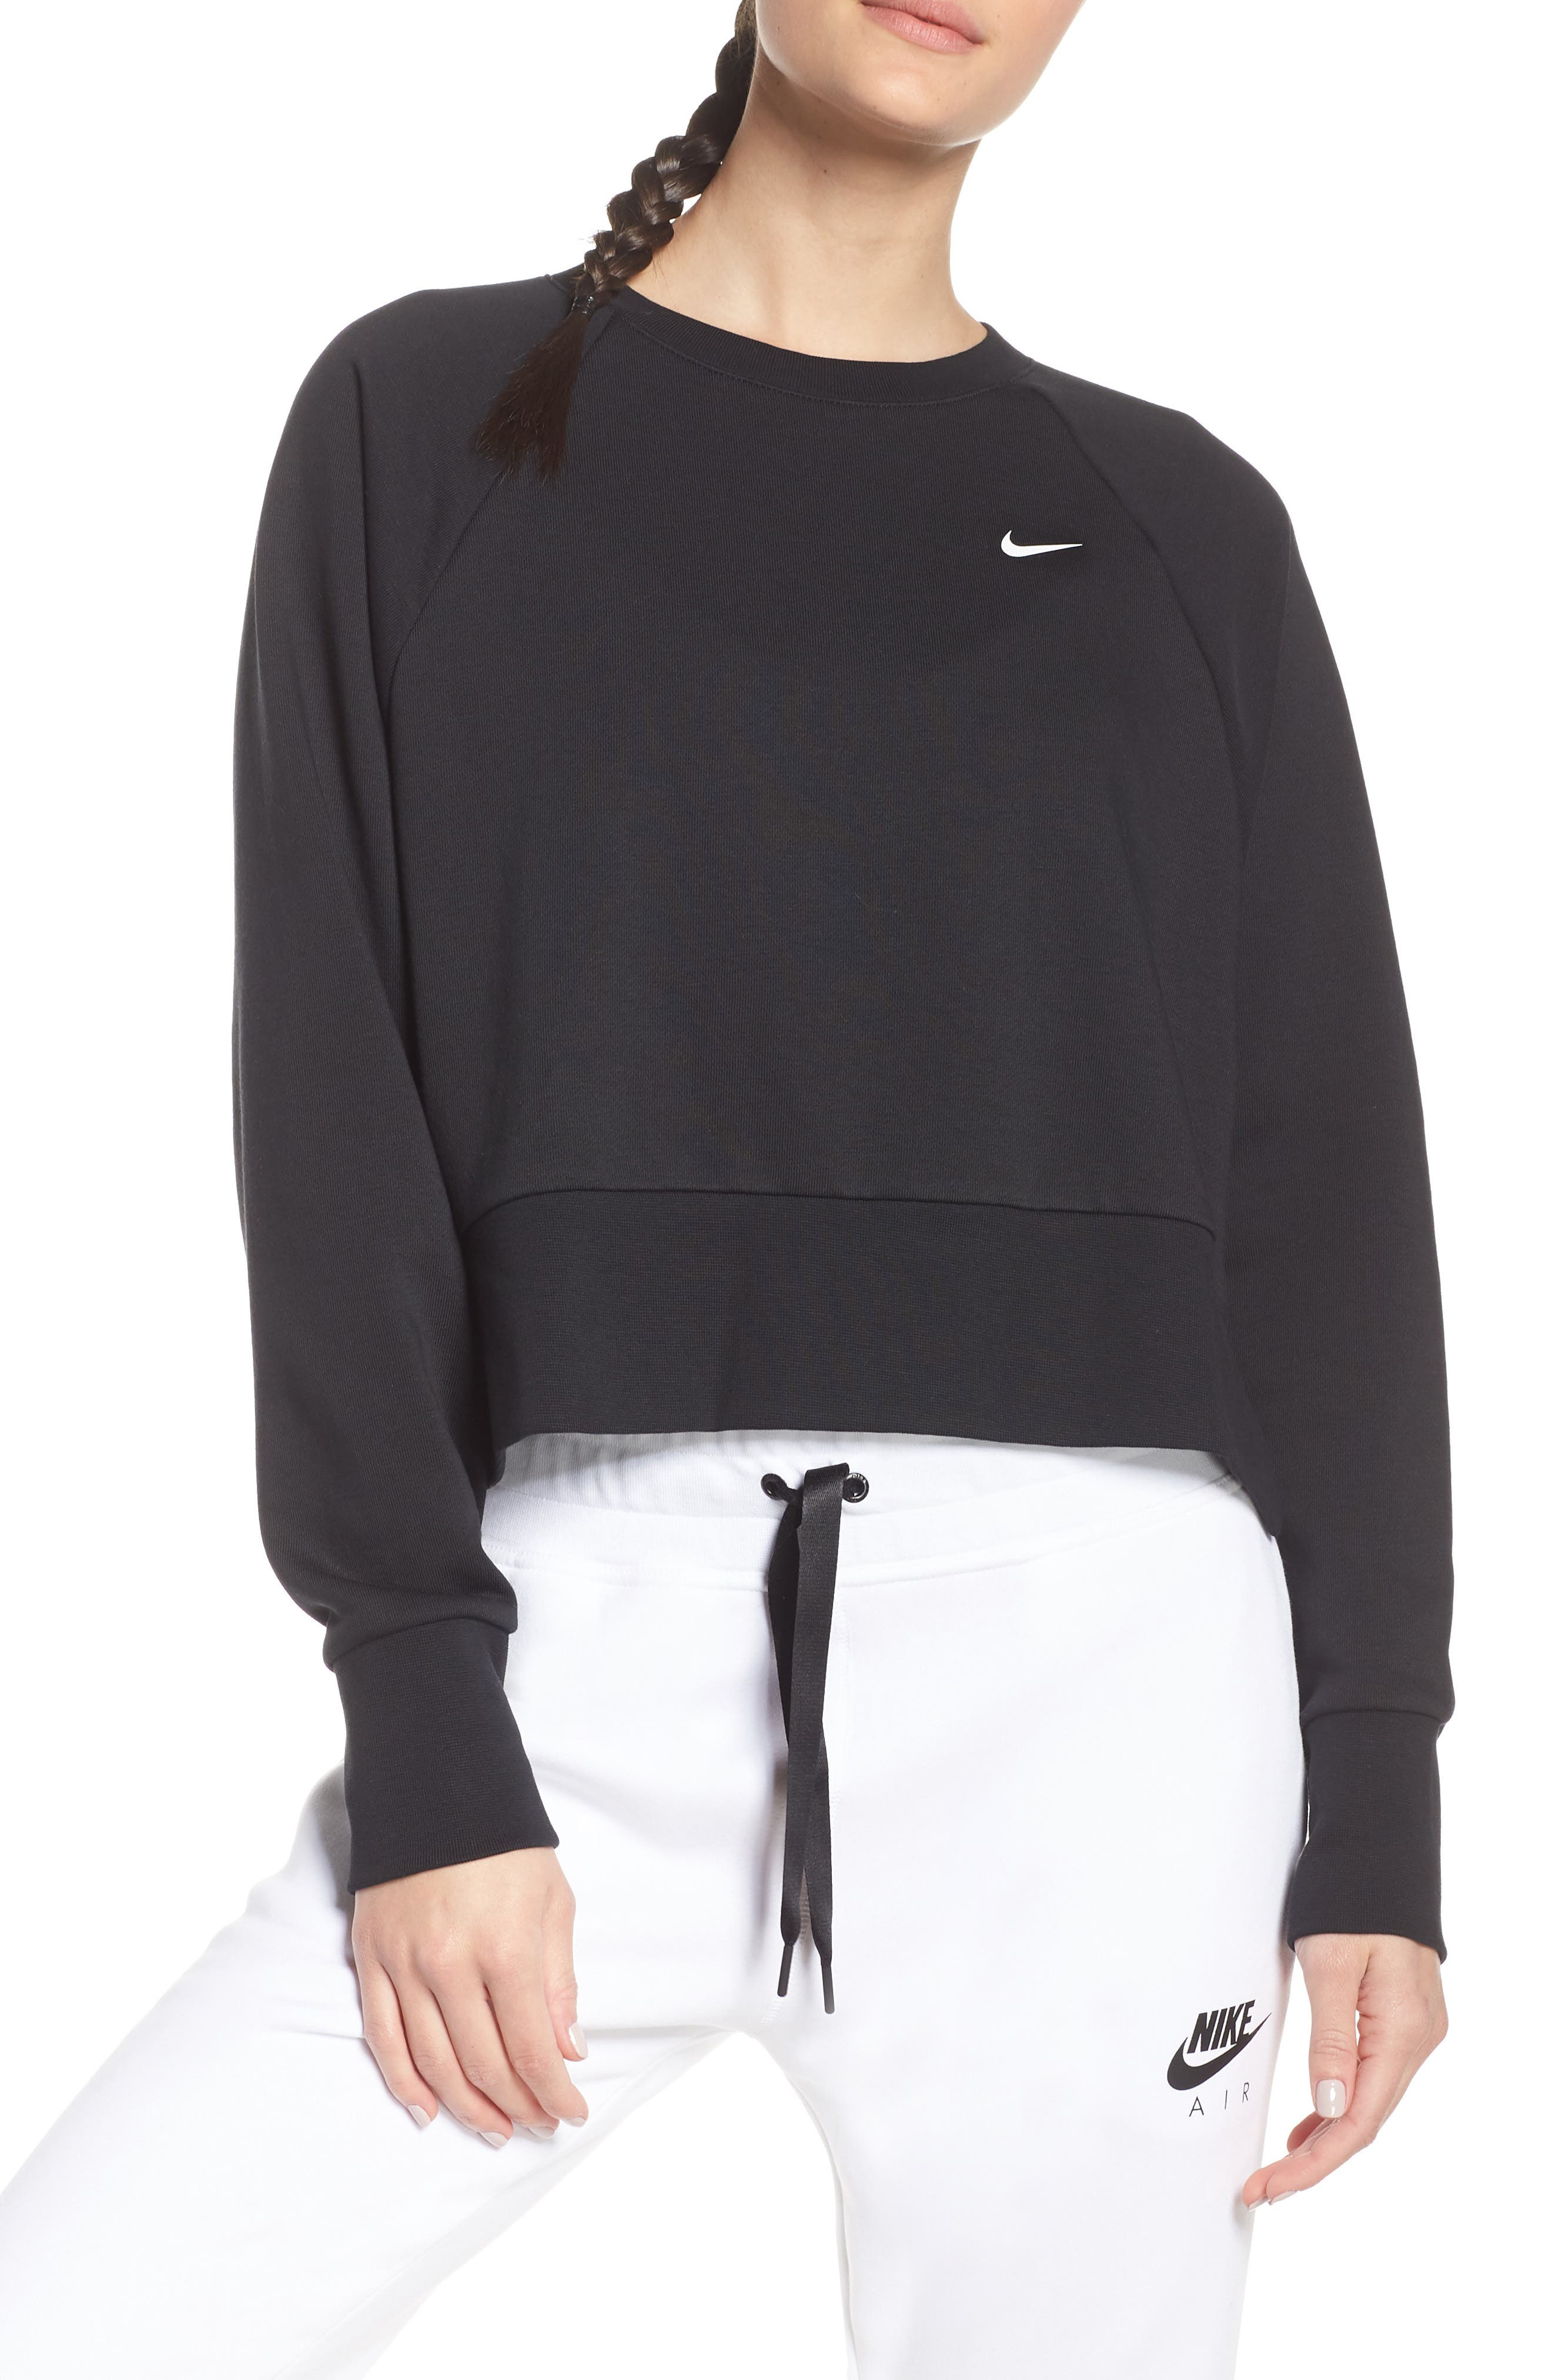 NIKE, Dry Cropped Training Sweatshirt, Main thumbnail 1, color, BLACK/ WHITE